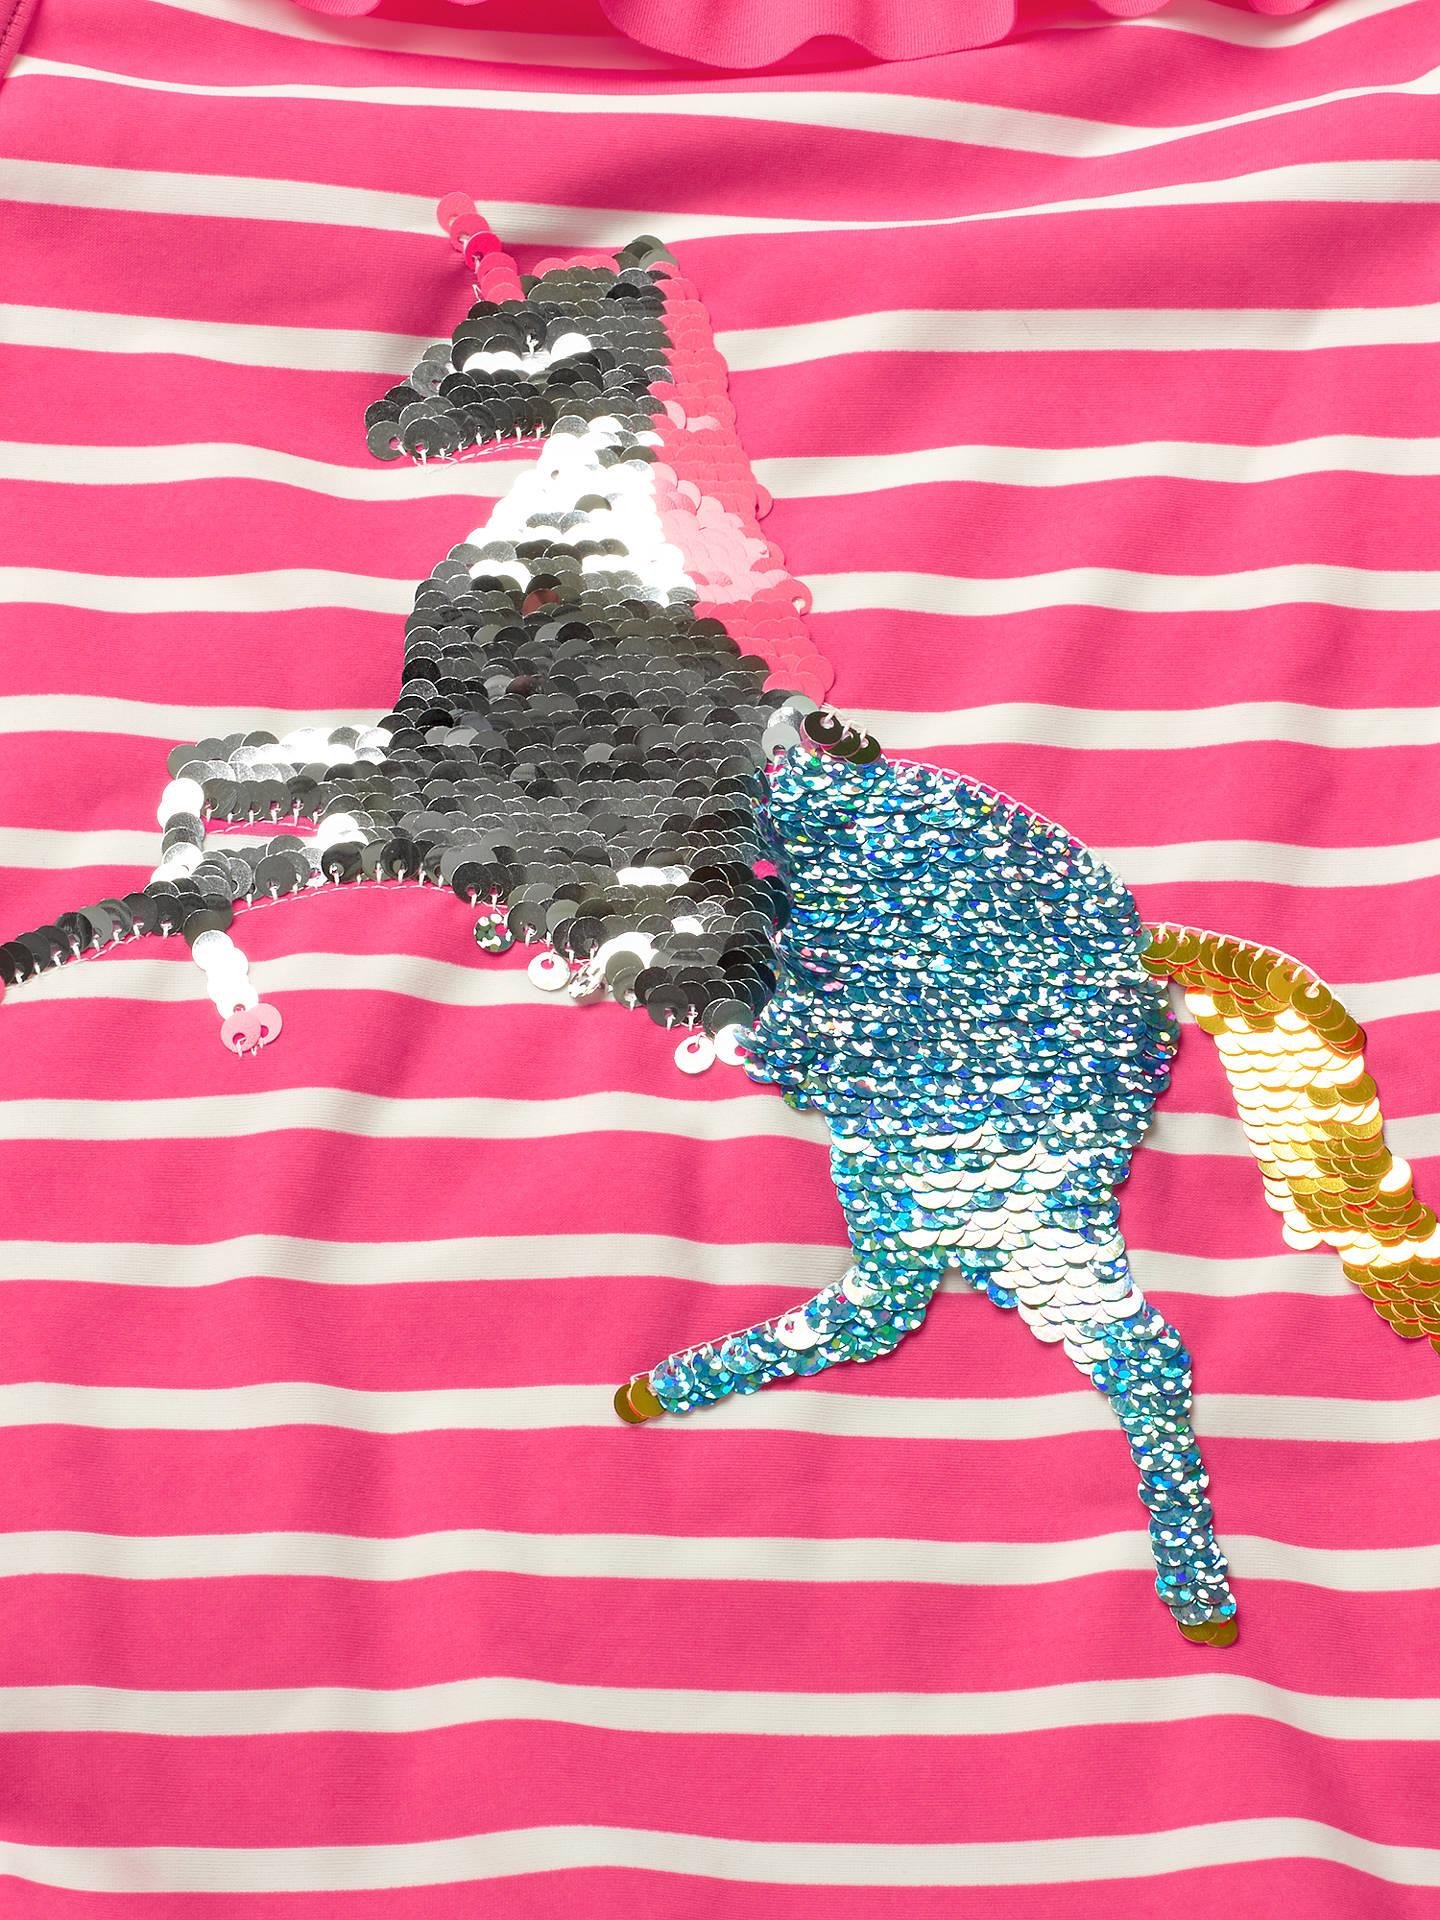 c8e595515320c ... Buy Mini Boden Girls' Unicorn Applique Swimsuit, Pink, 11-12 years  Online